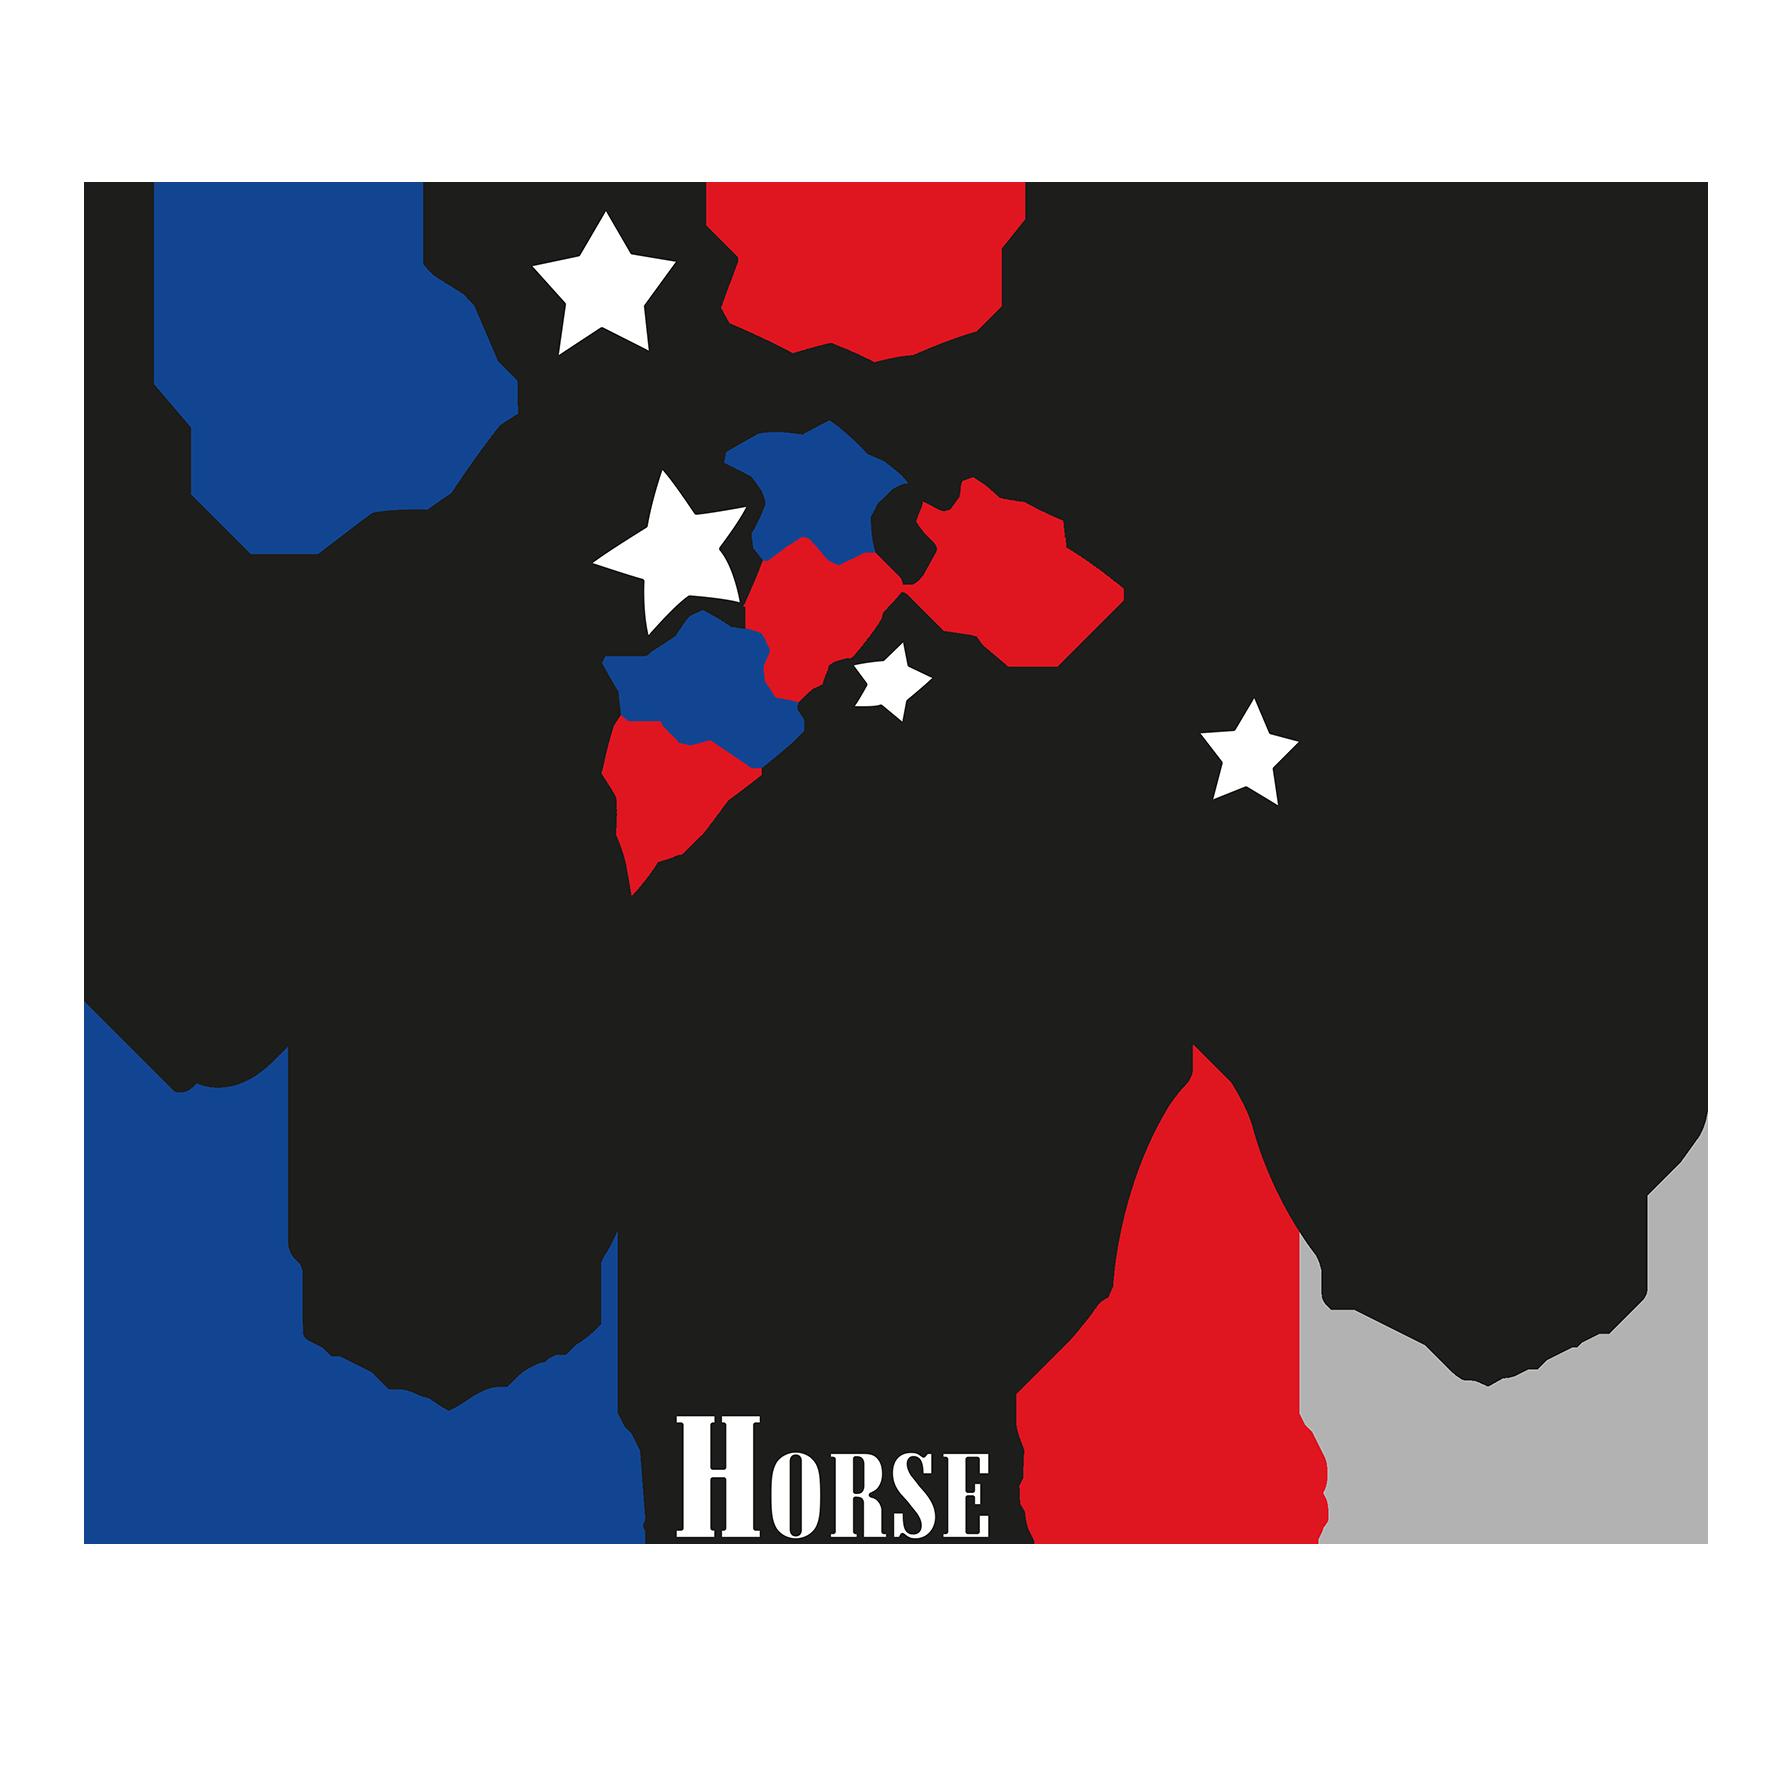 Appaloosa Horse Club Logo Png - Final Final Logo, Transparent background PNG HD thumbnail